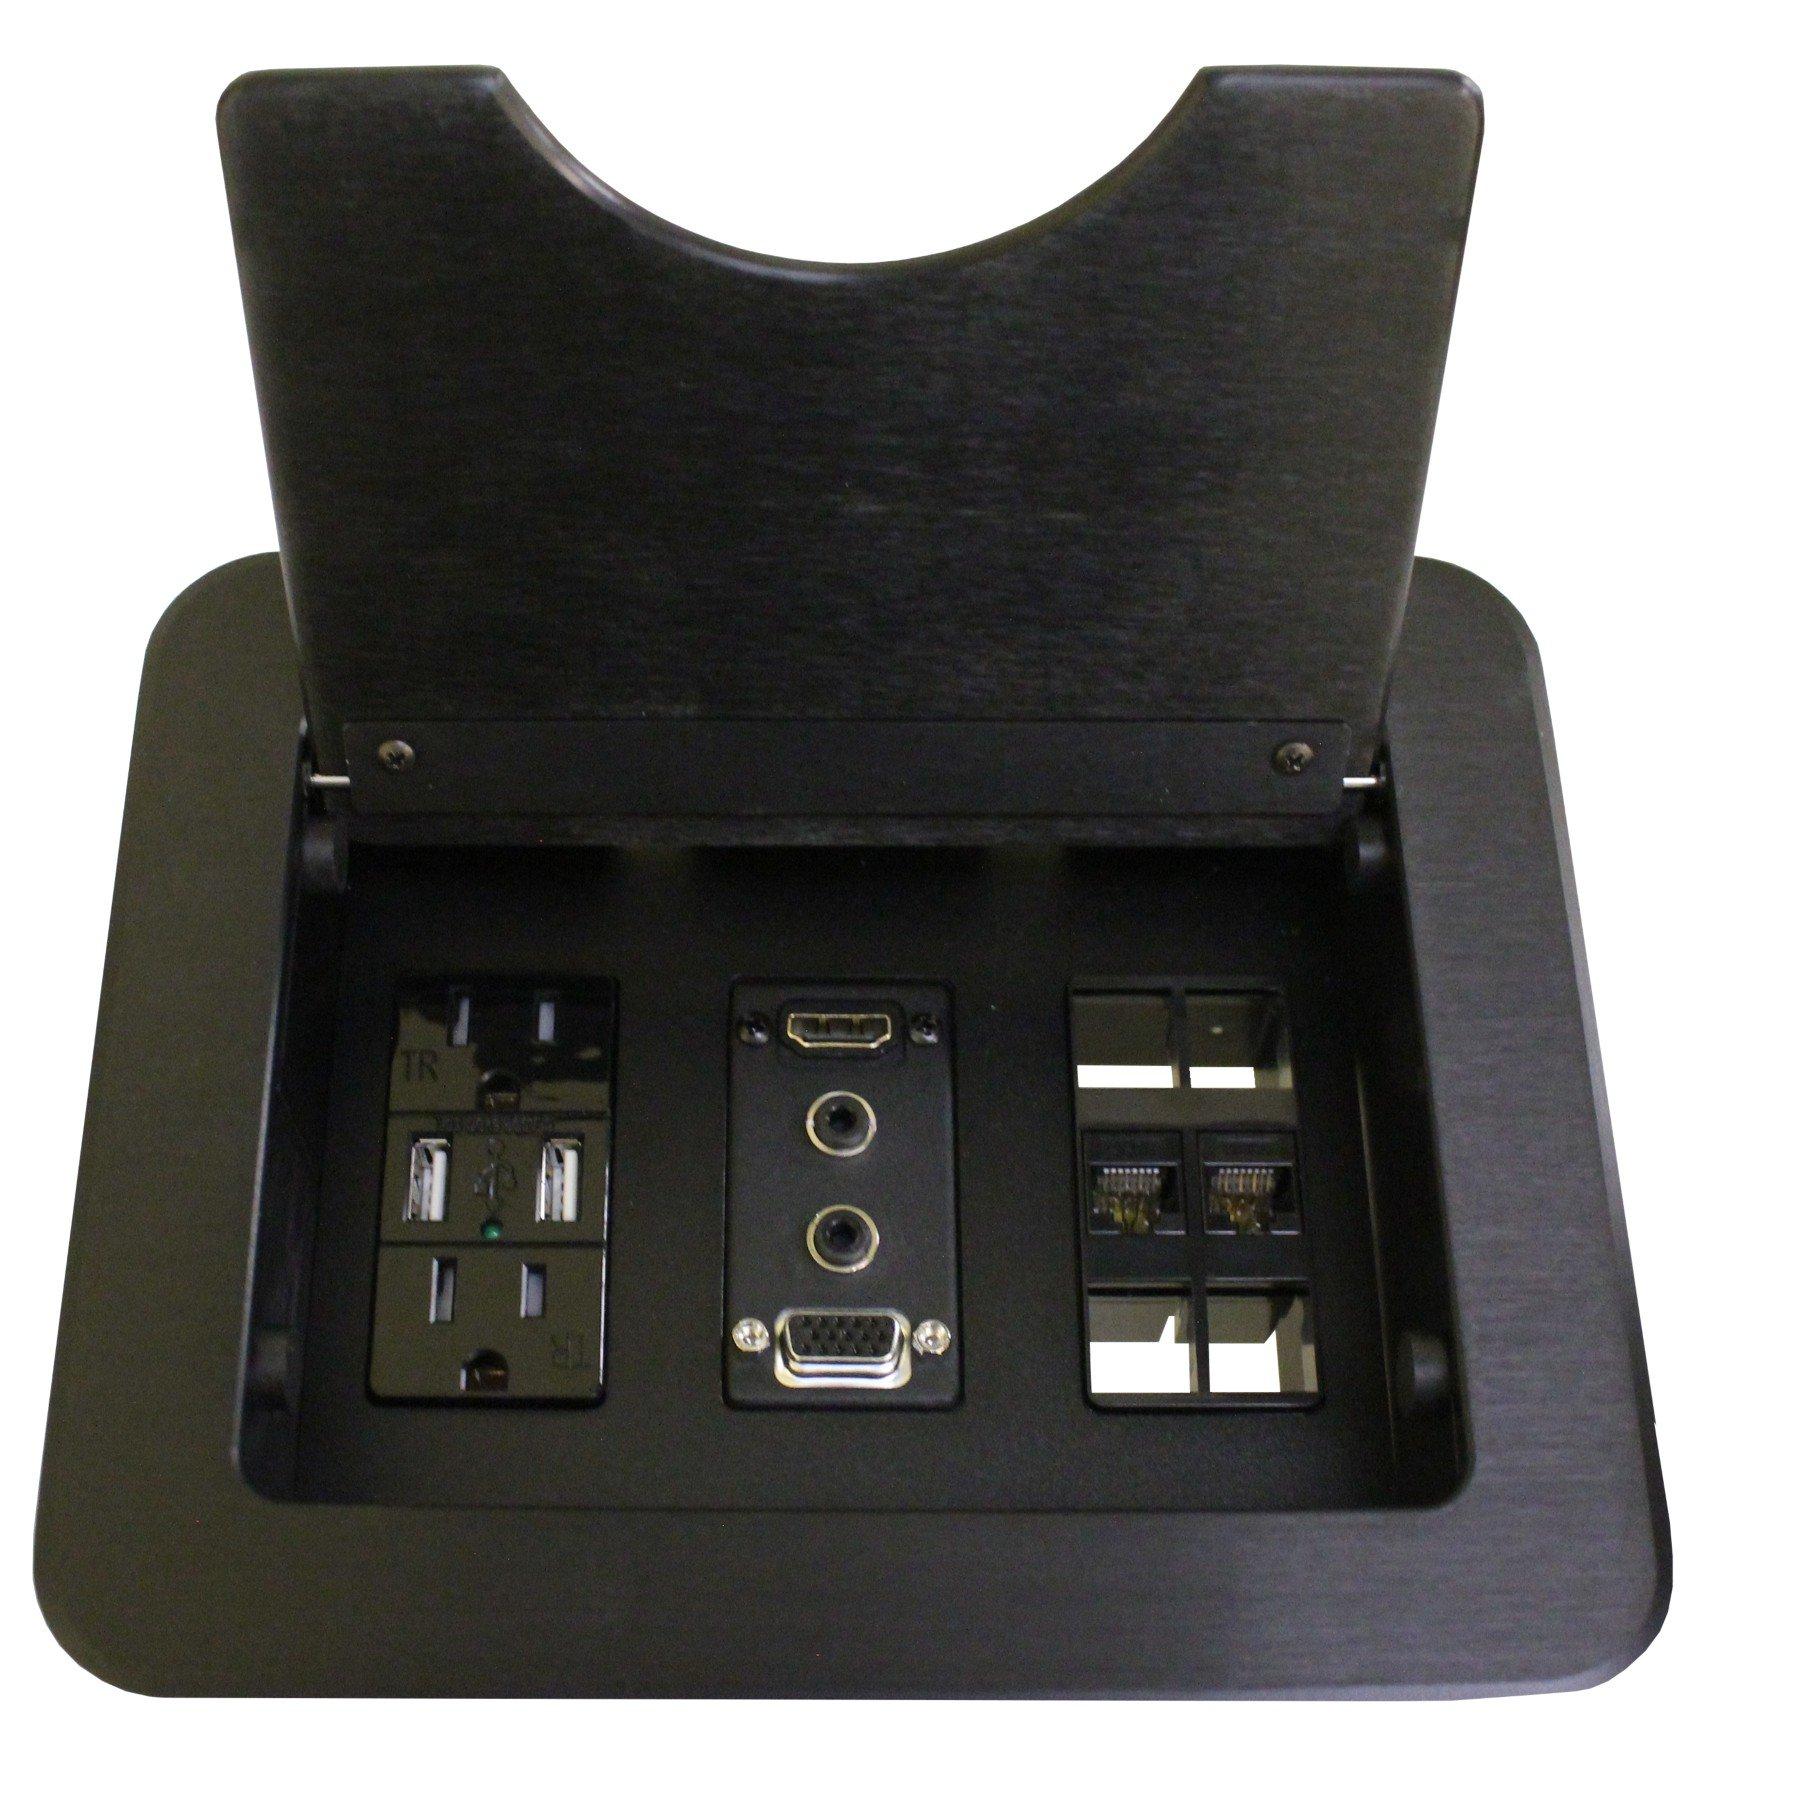 Altinex CNK210 Cable Nook w/ Power, USB Charging, HDMI, VGA, Cat6